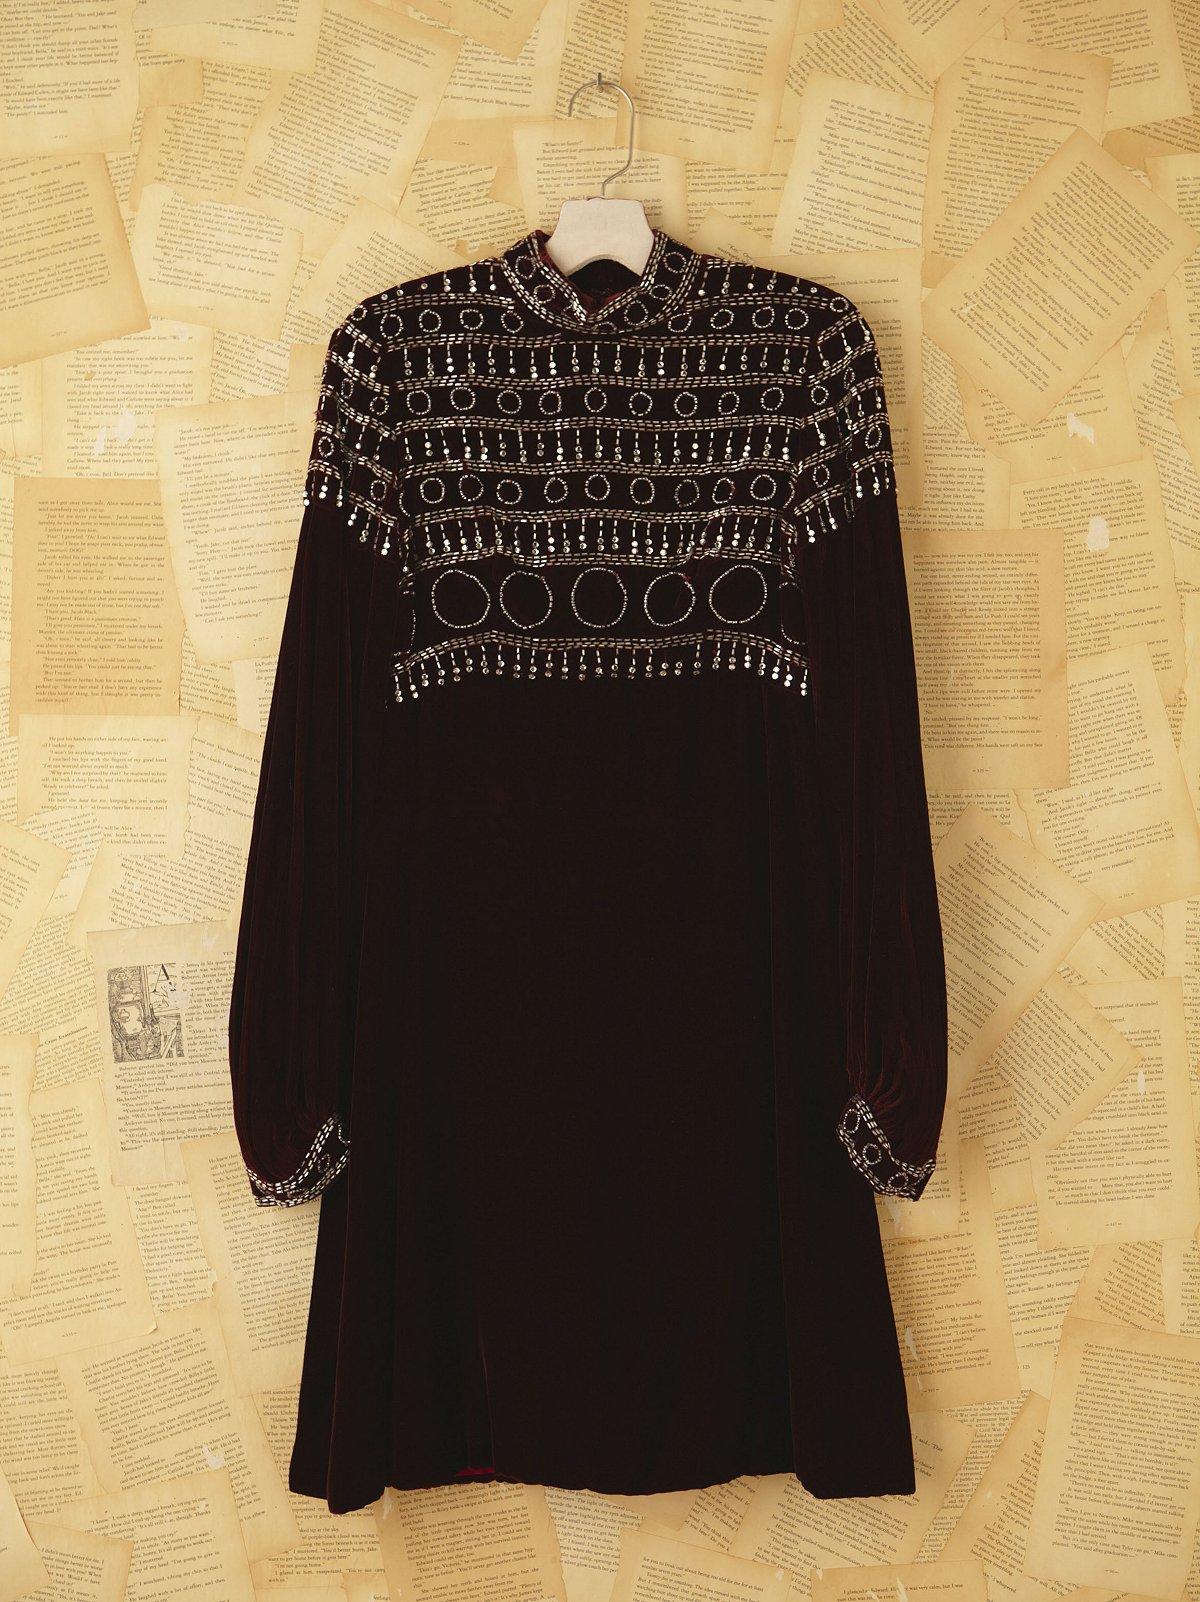 Vintage 1960s Velvet Party Dress